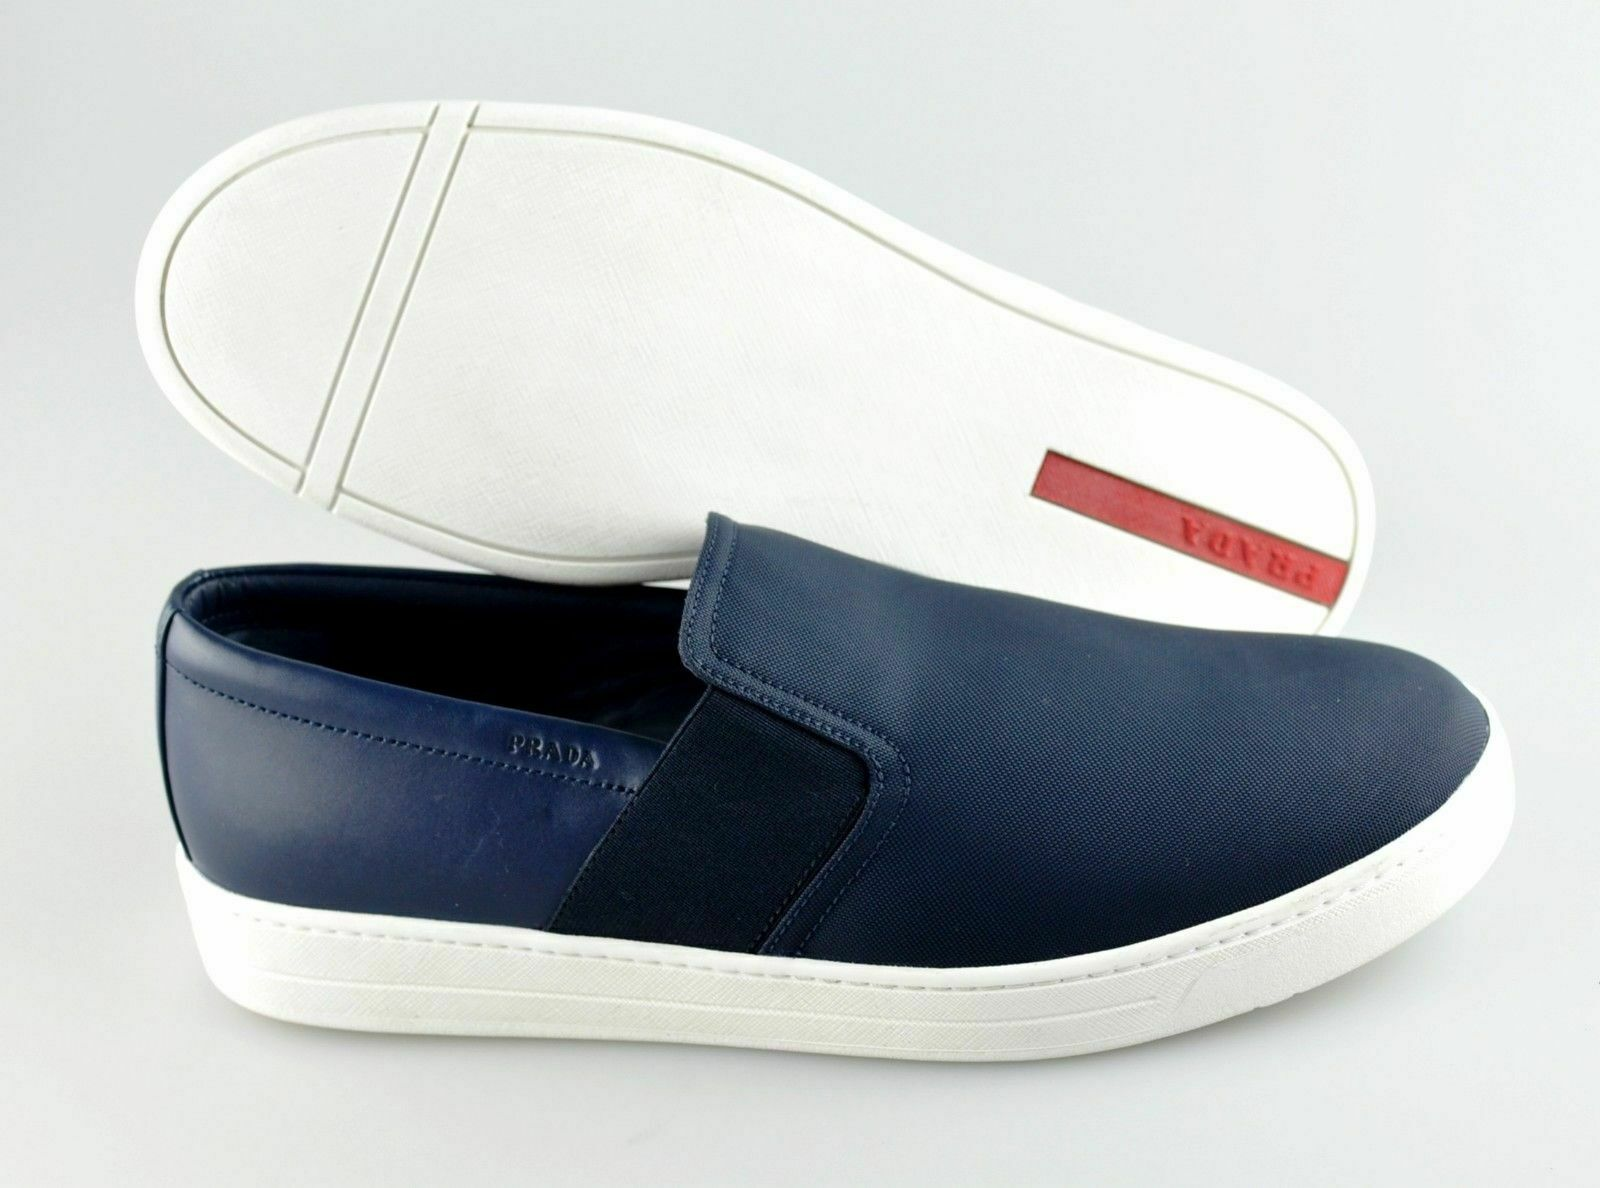 Men's PRADA 'Slip-On' Navy blu Leather Fabric scarpe da ginnastica Dimensione US 9 PRADA 8